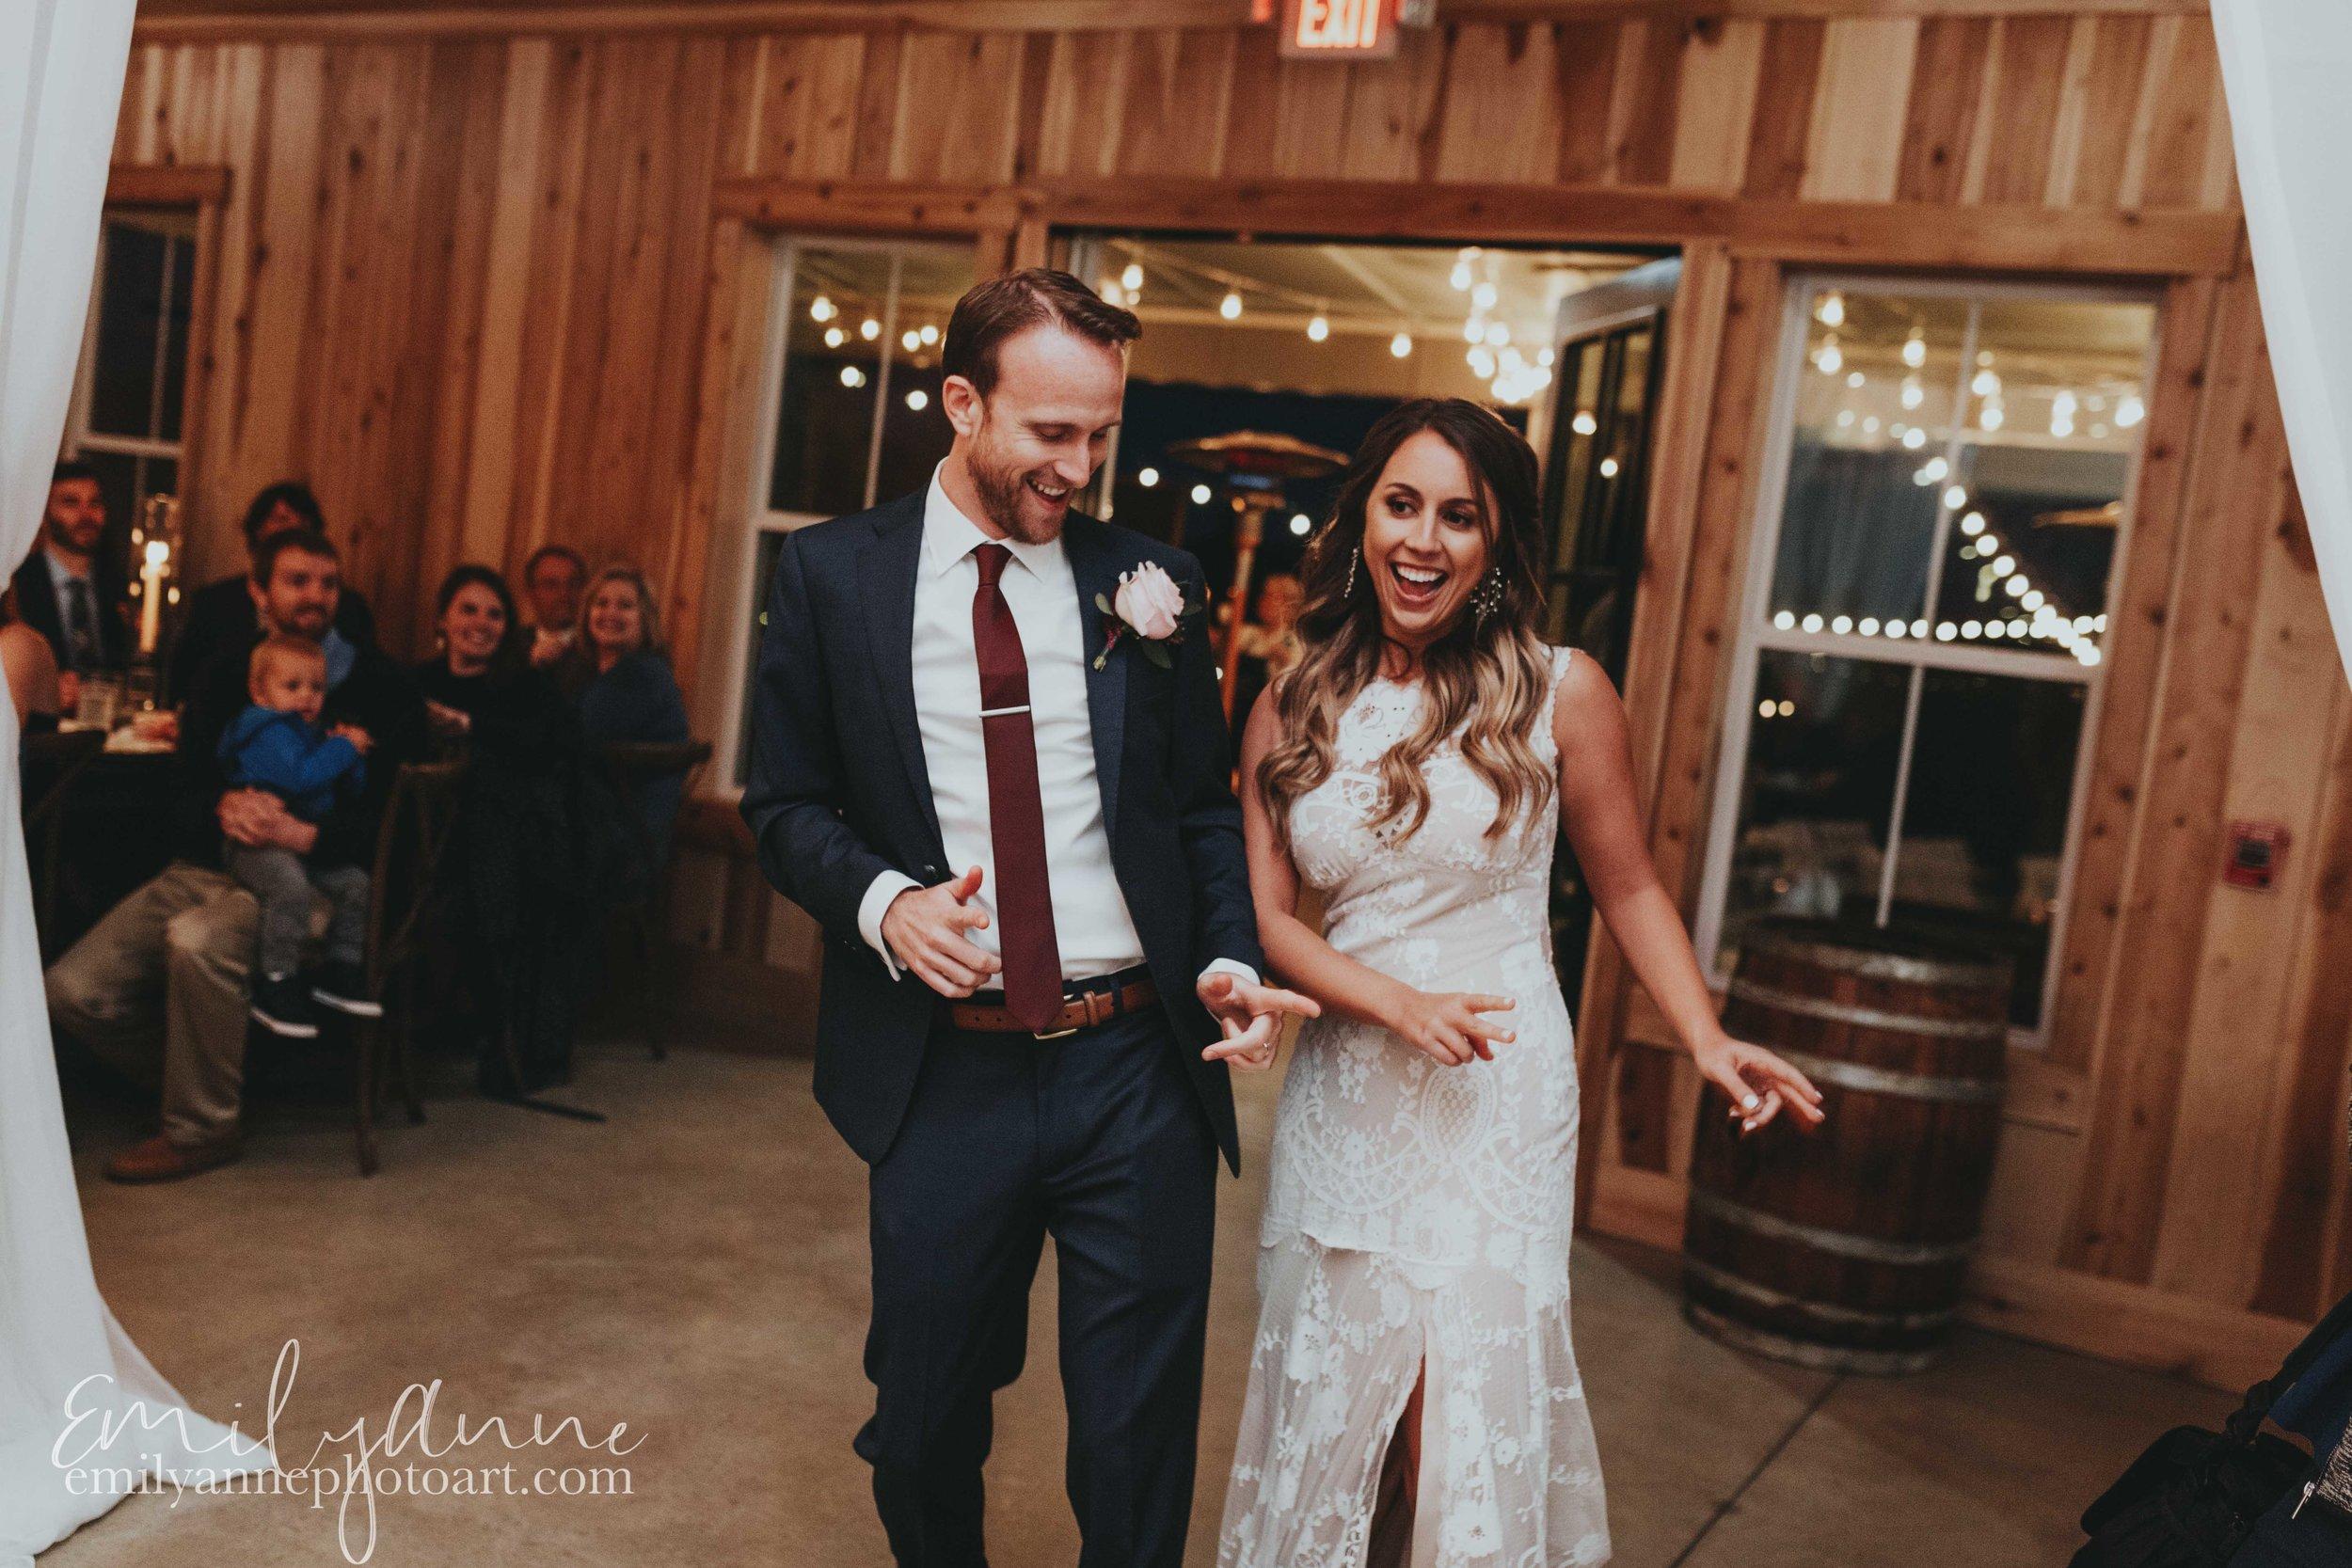 best dance partner at wedding